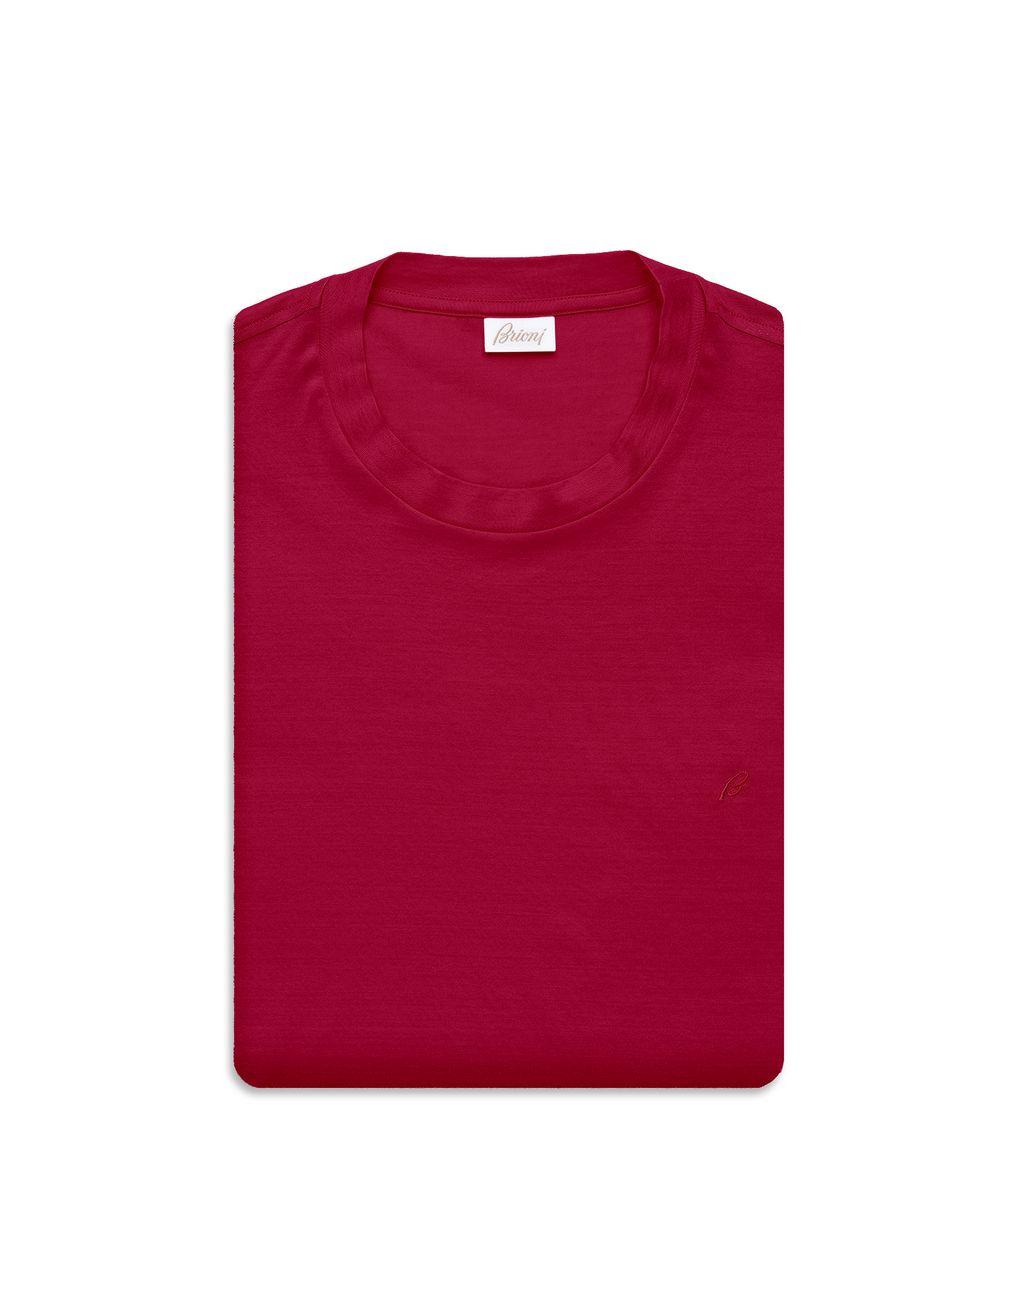 BRIONI Бордовая футболка с логотипом Футболки и поло Для Мужчин e